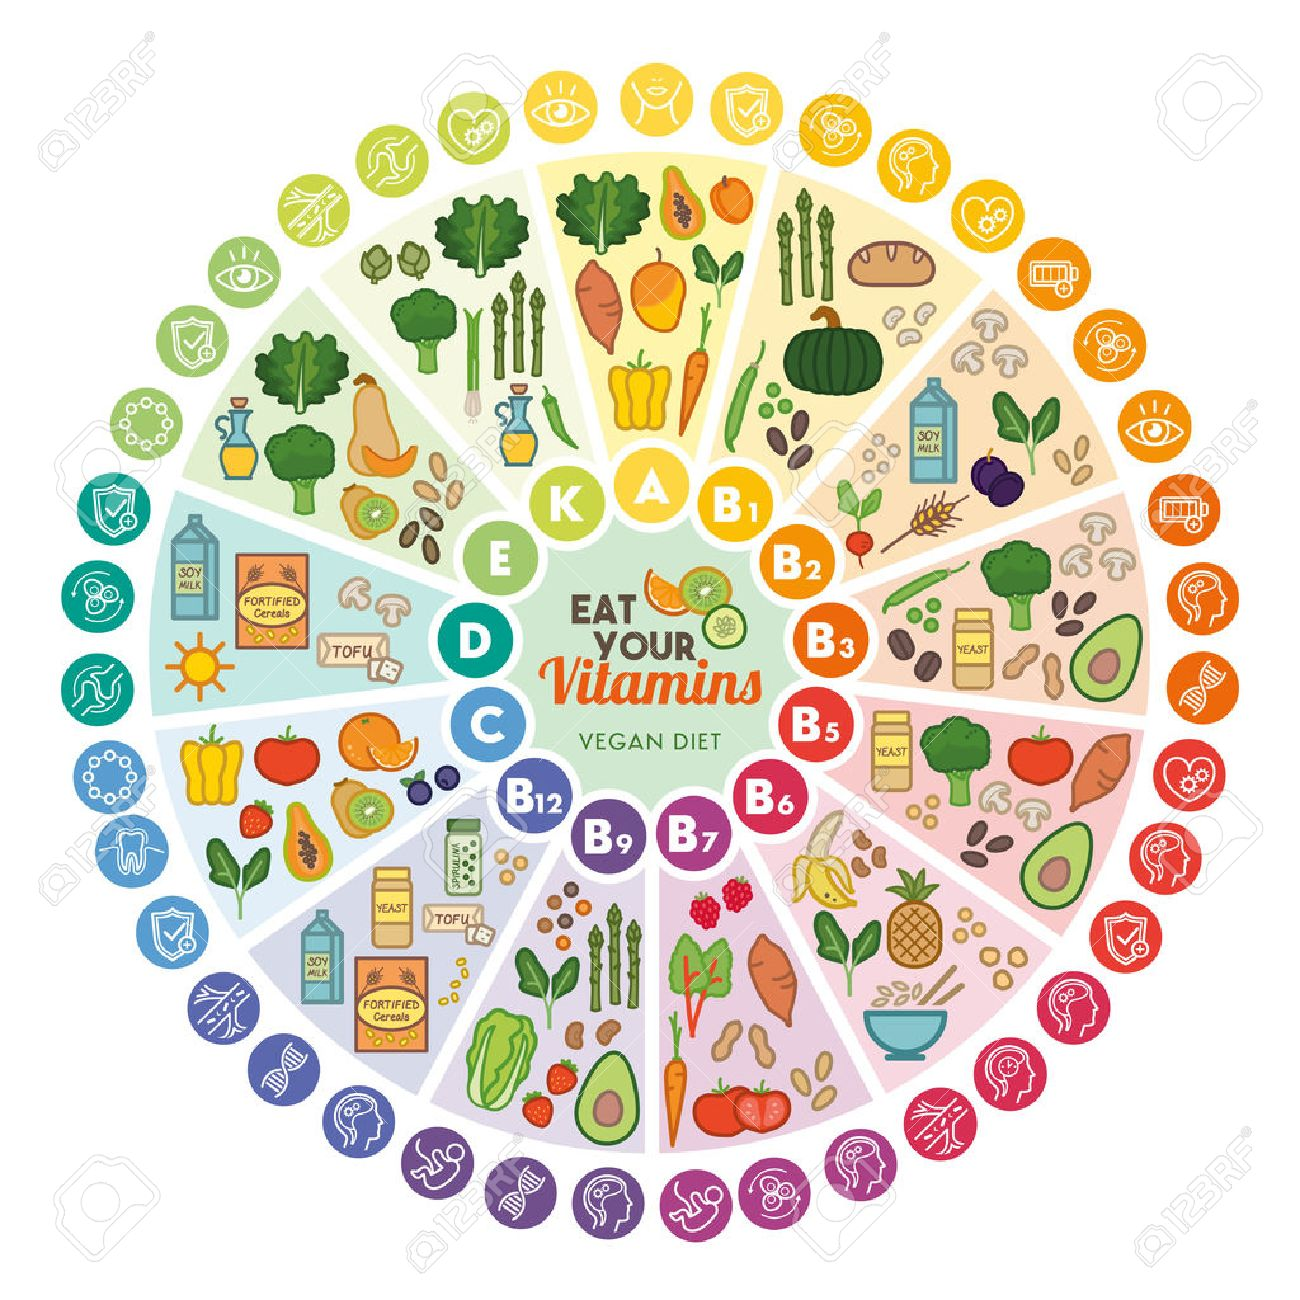 Image result for vegan food charts